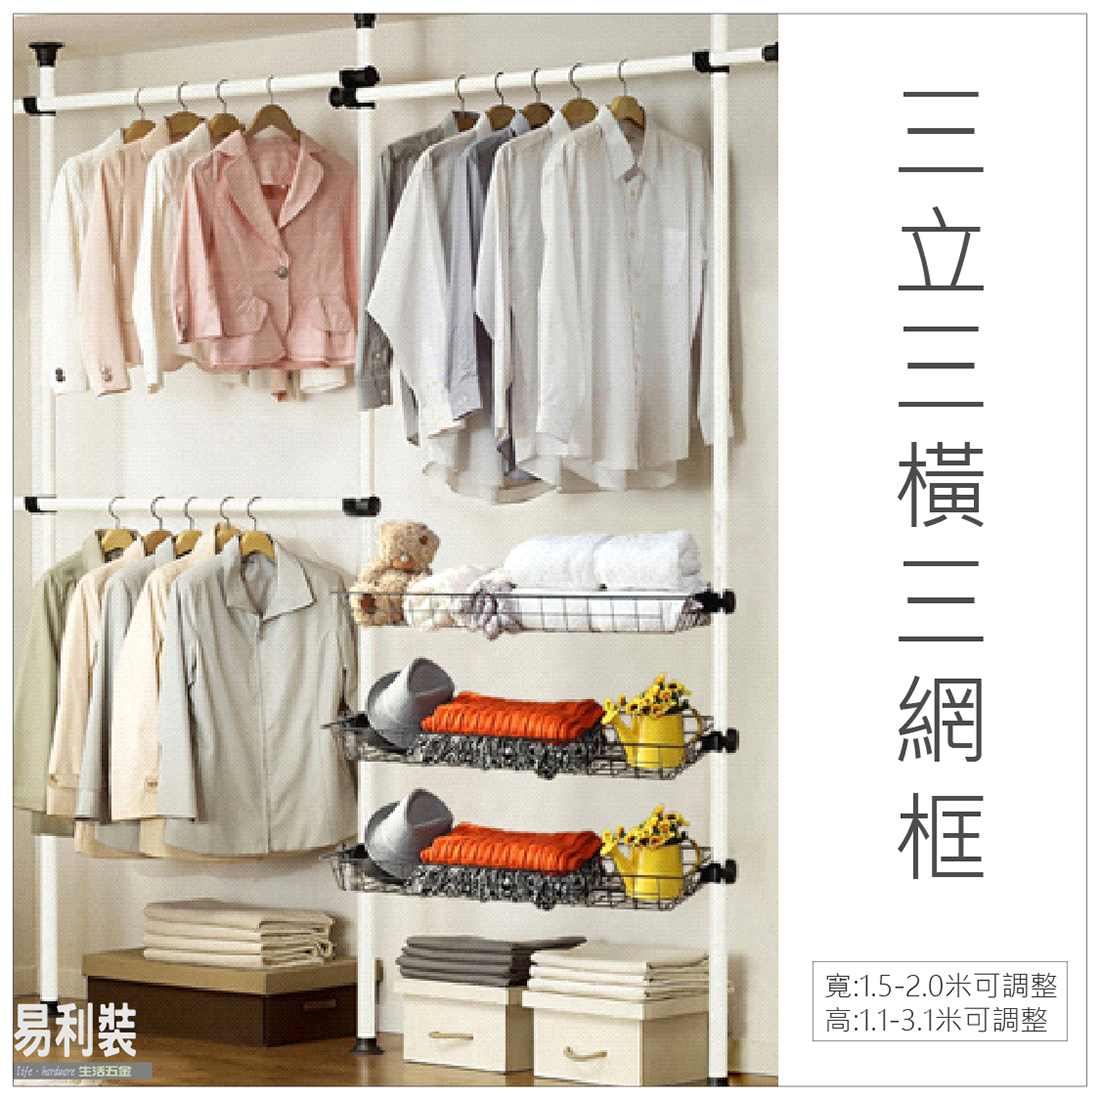 【 EASYCAN  】ECR013 頂天立地組合 易利裝生活五金 房間 臥房 衣櫃 小資族 辦公家具 系統家具 0